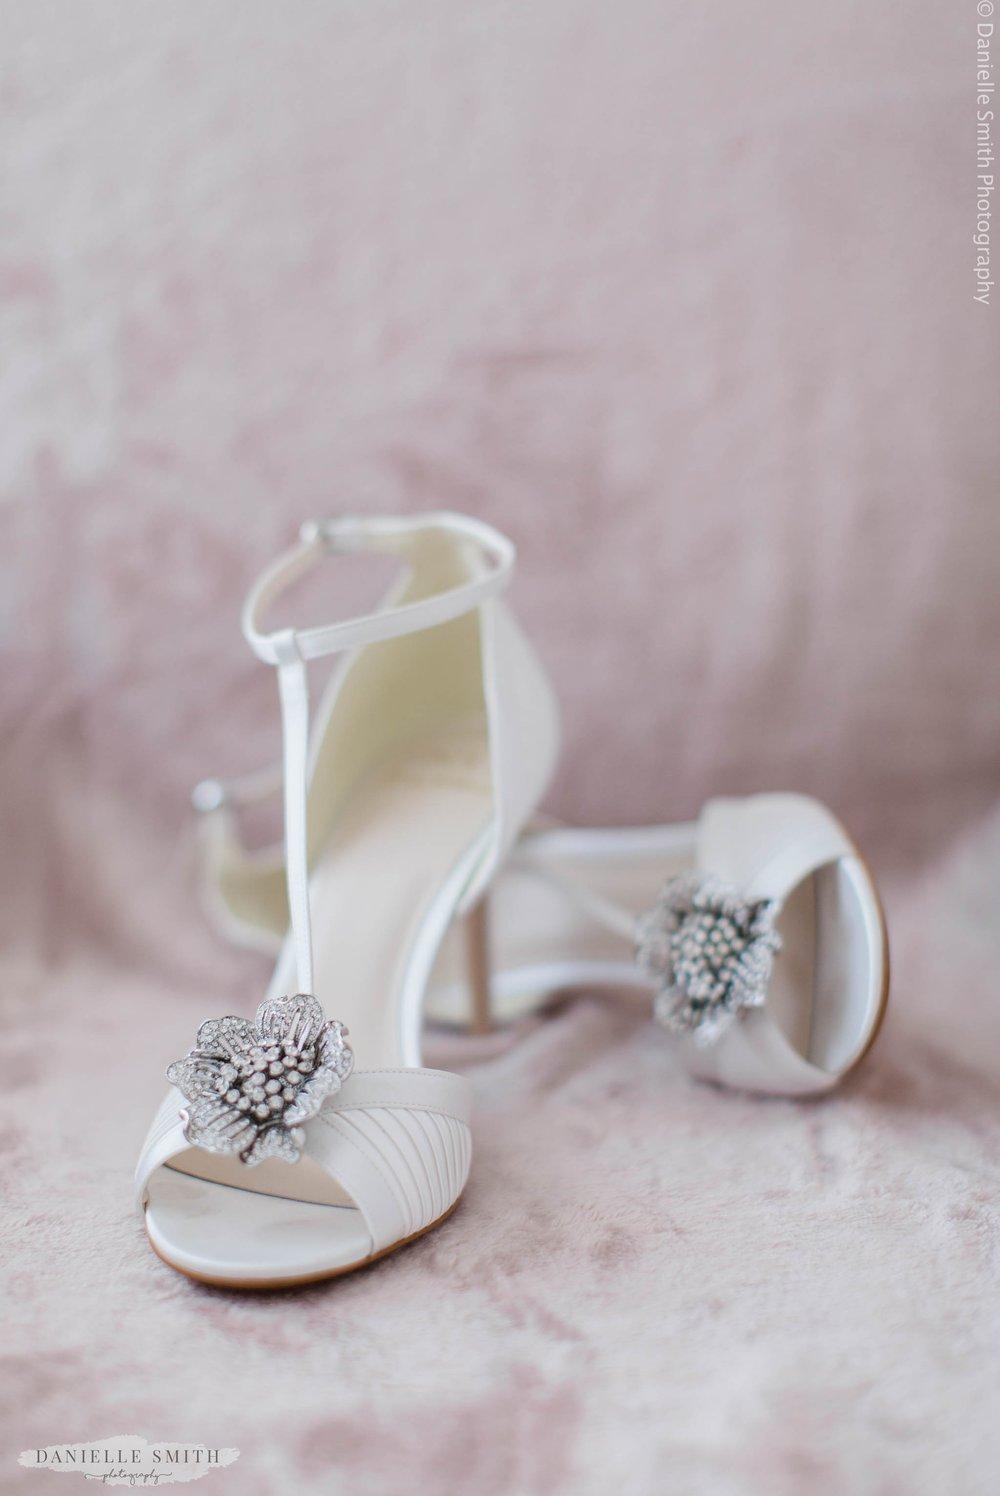 ivory wedding hells with flower embellishment